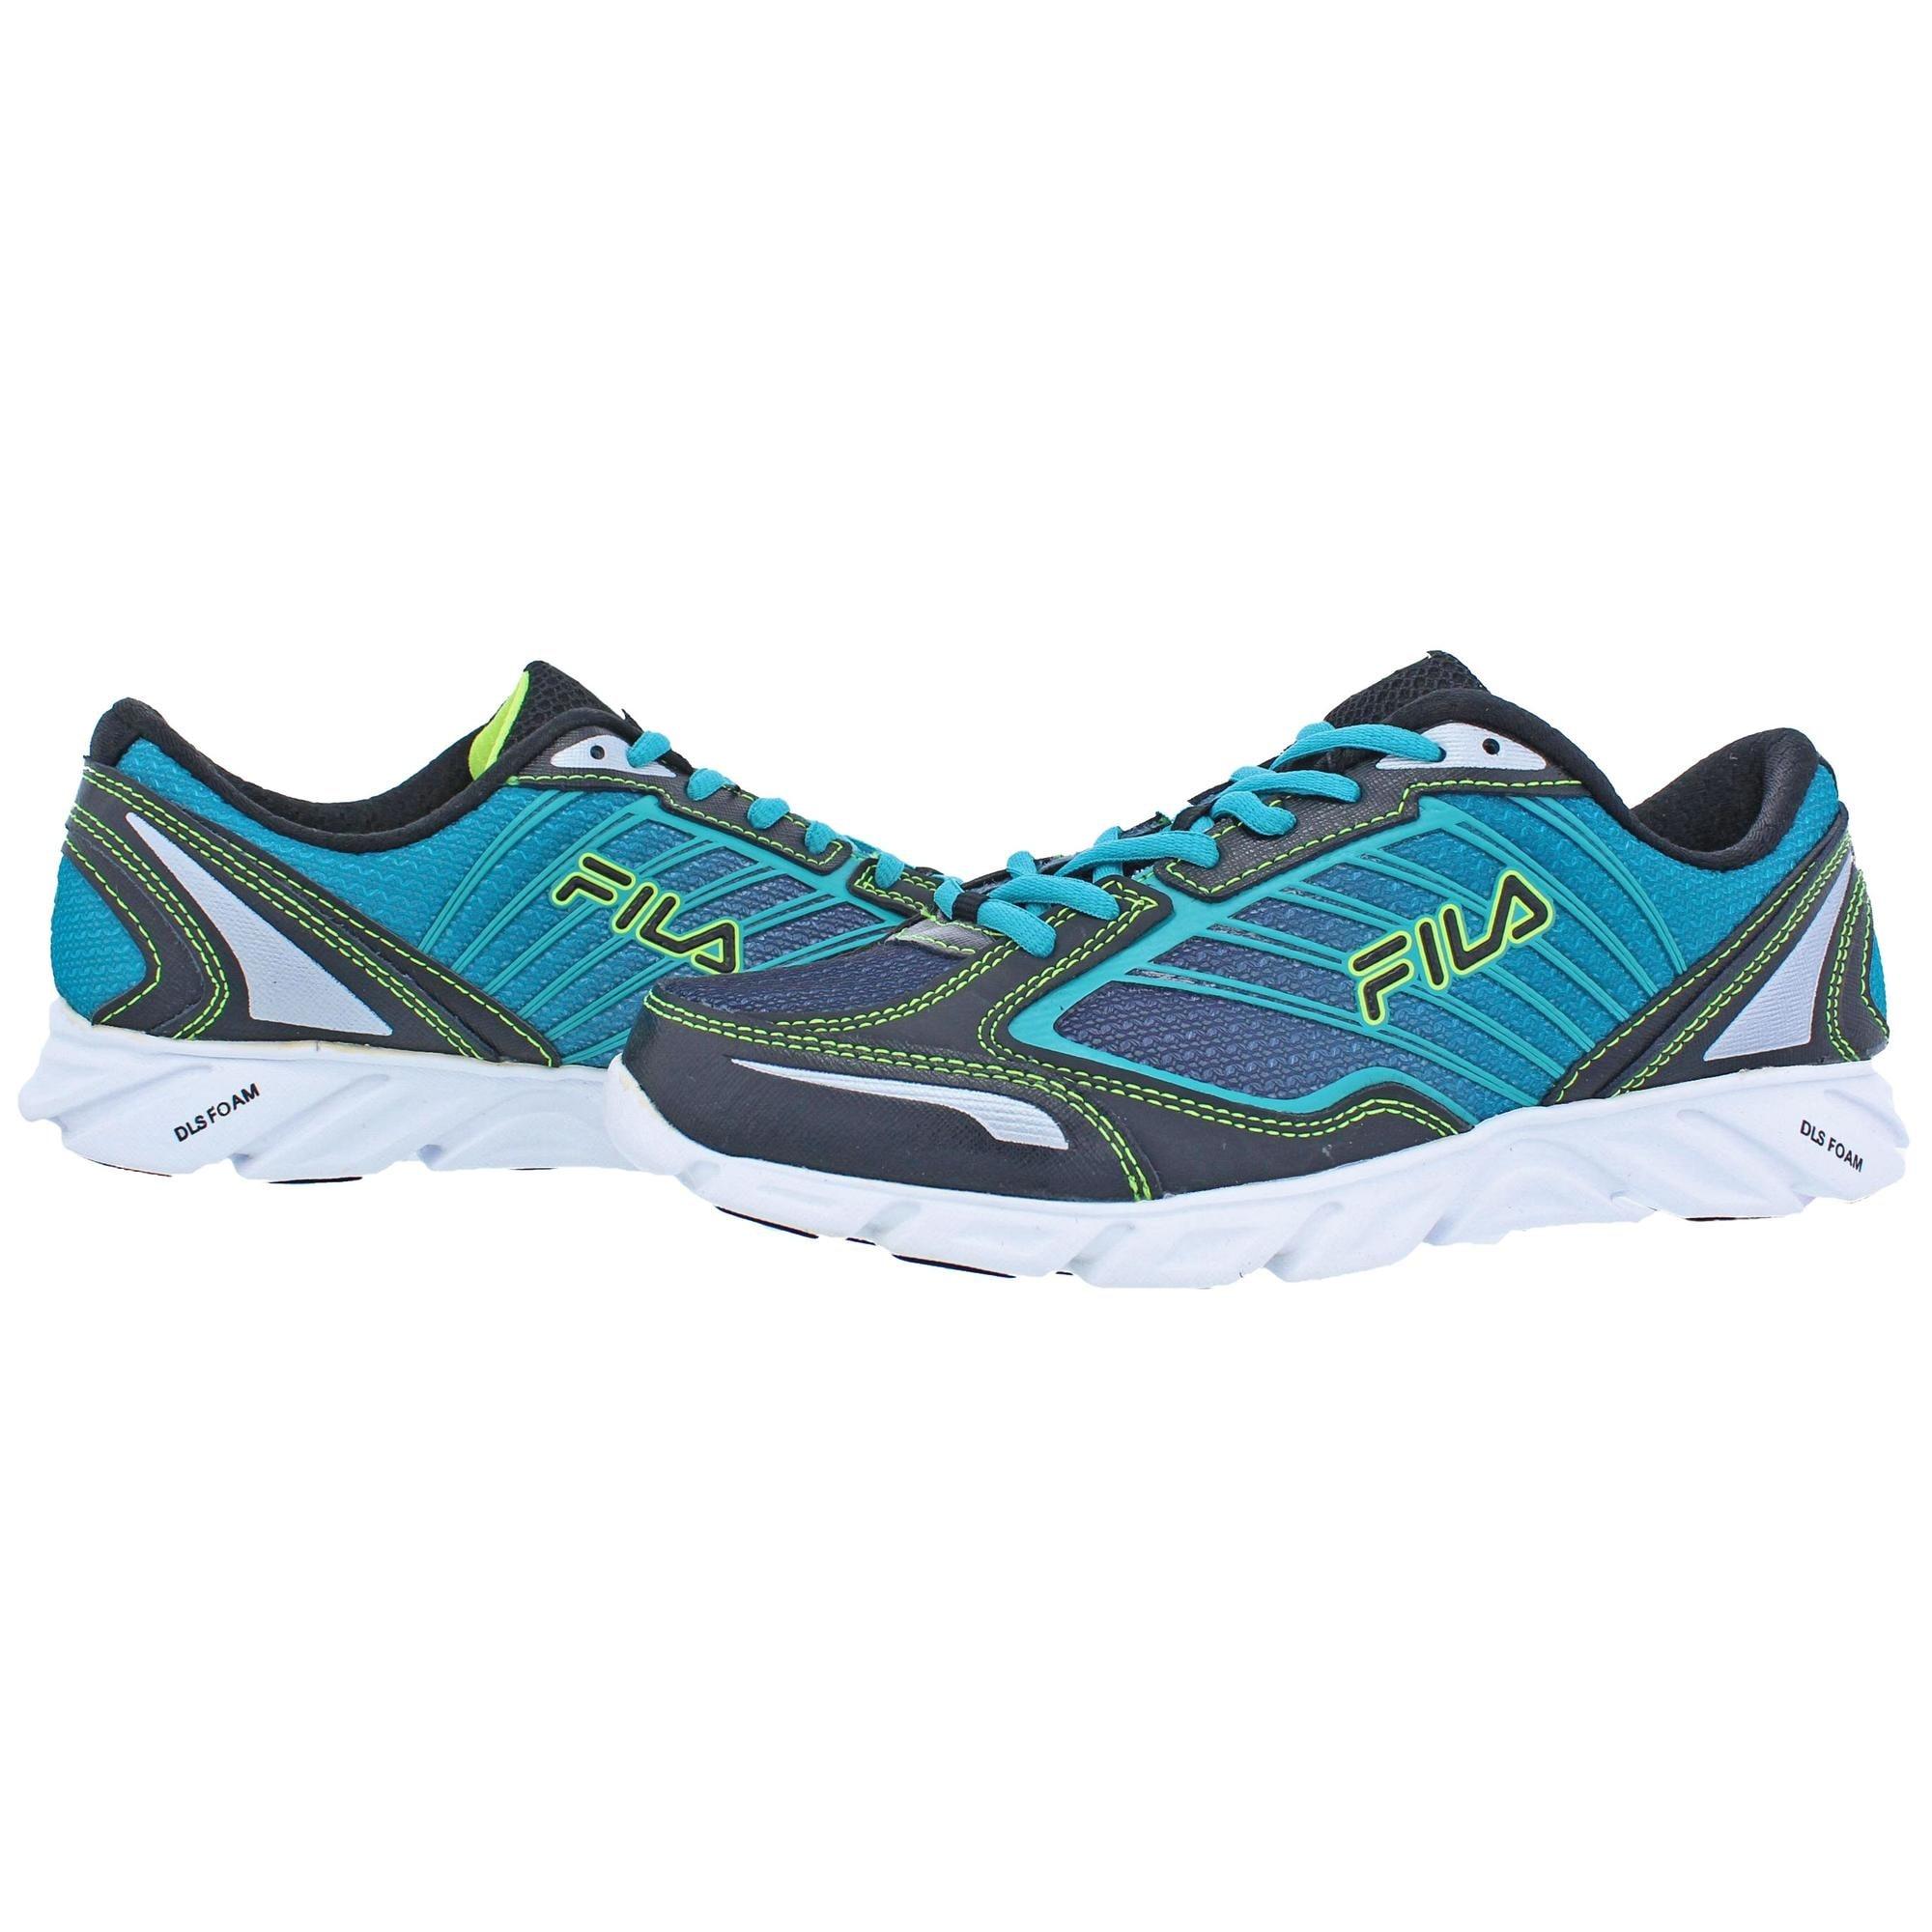 Running Shoes Cool Max DLS Foam